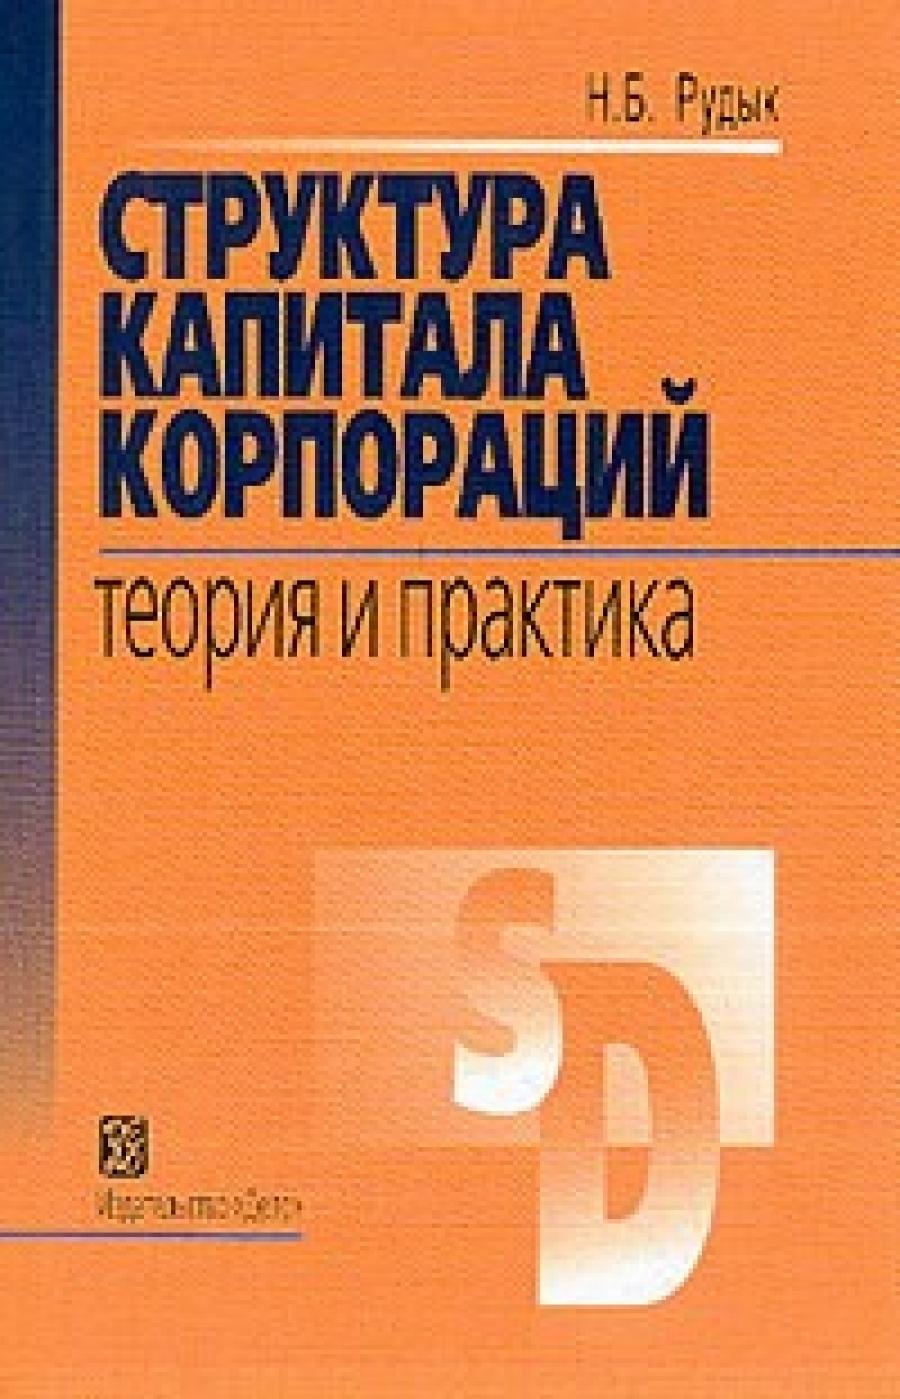 Обложка книги:  рудык н.б. - структура капитала корпораций